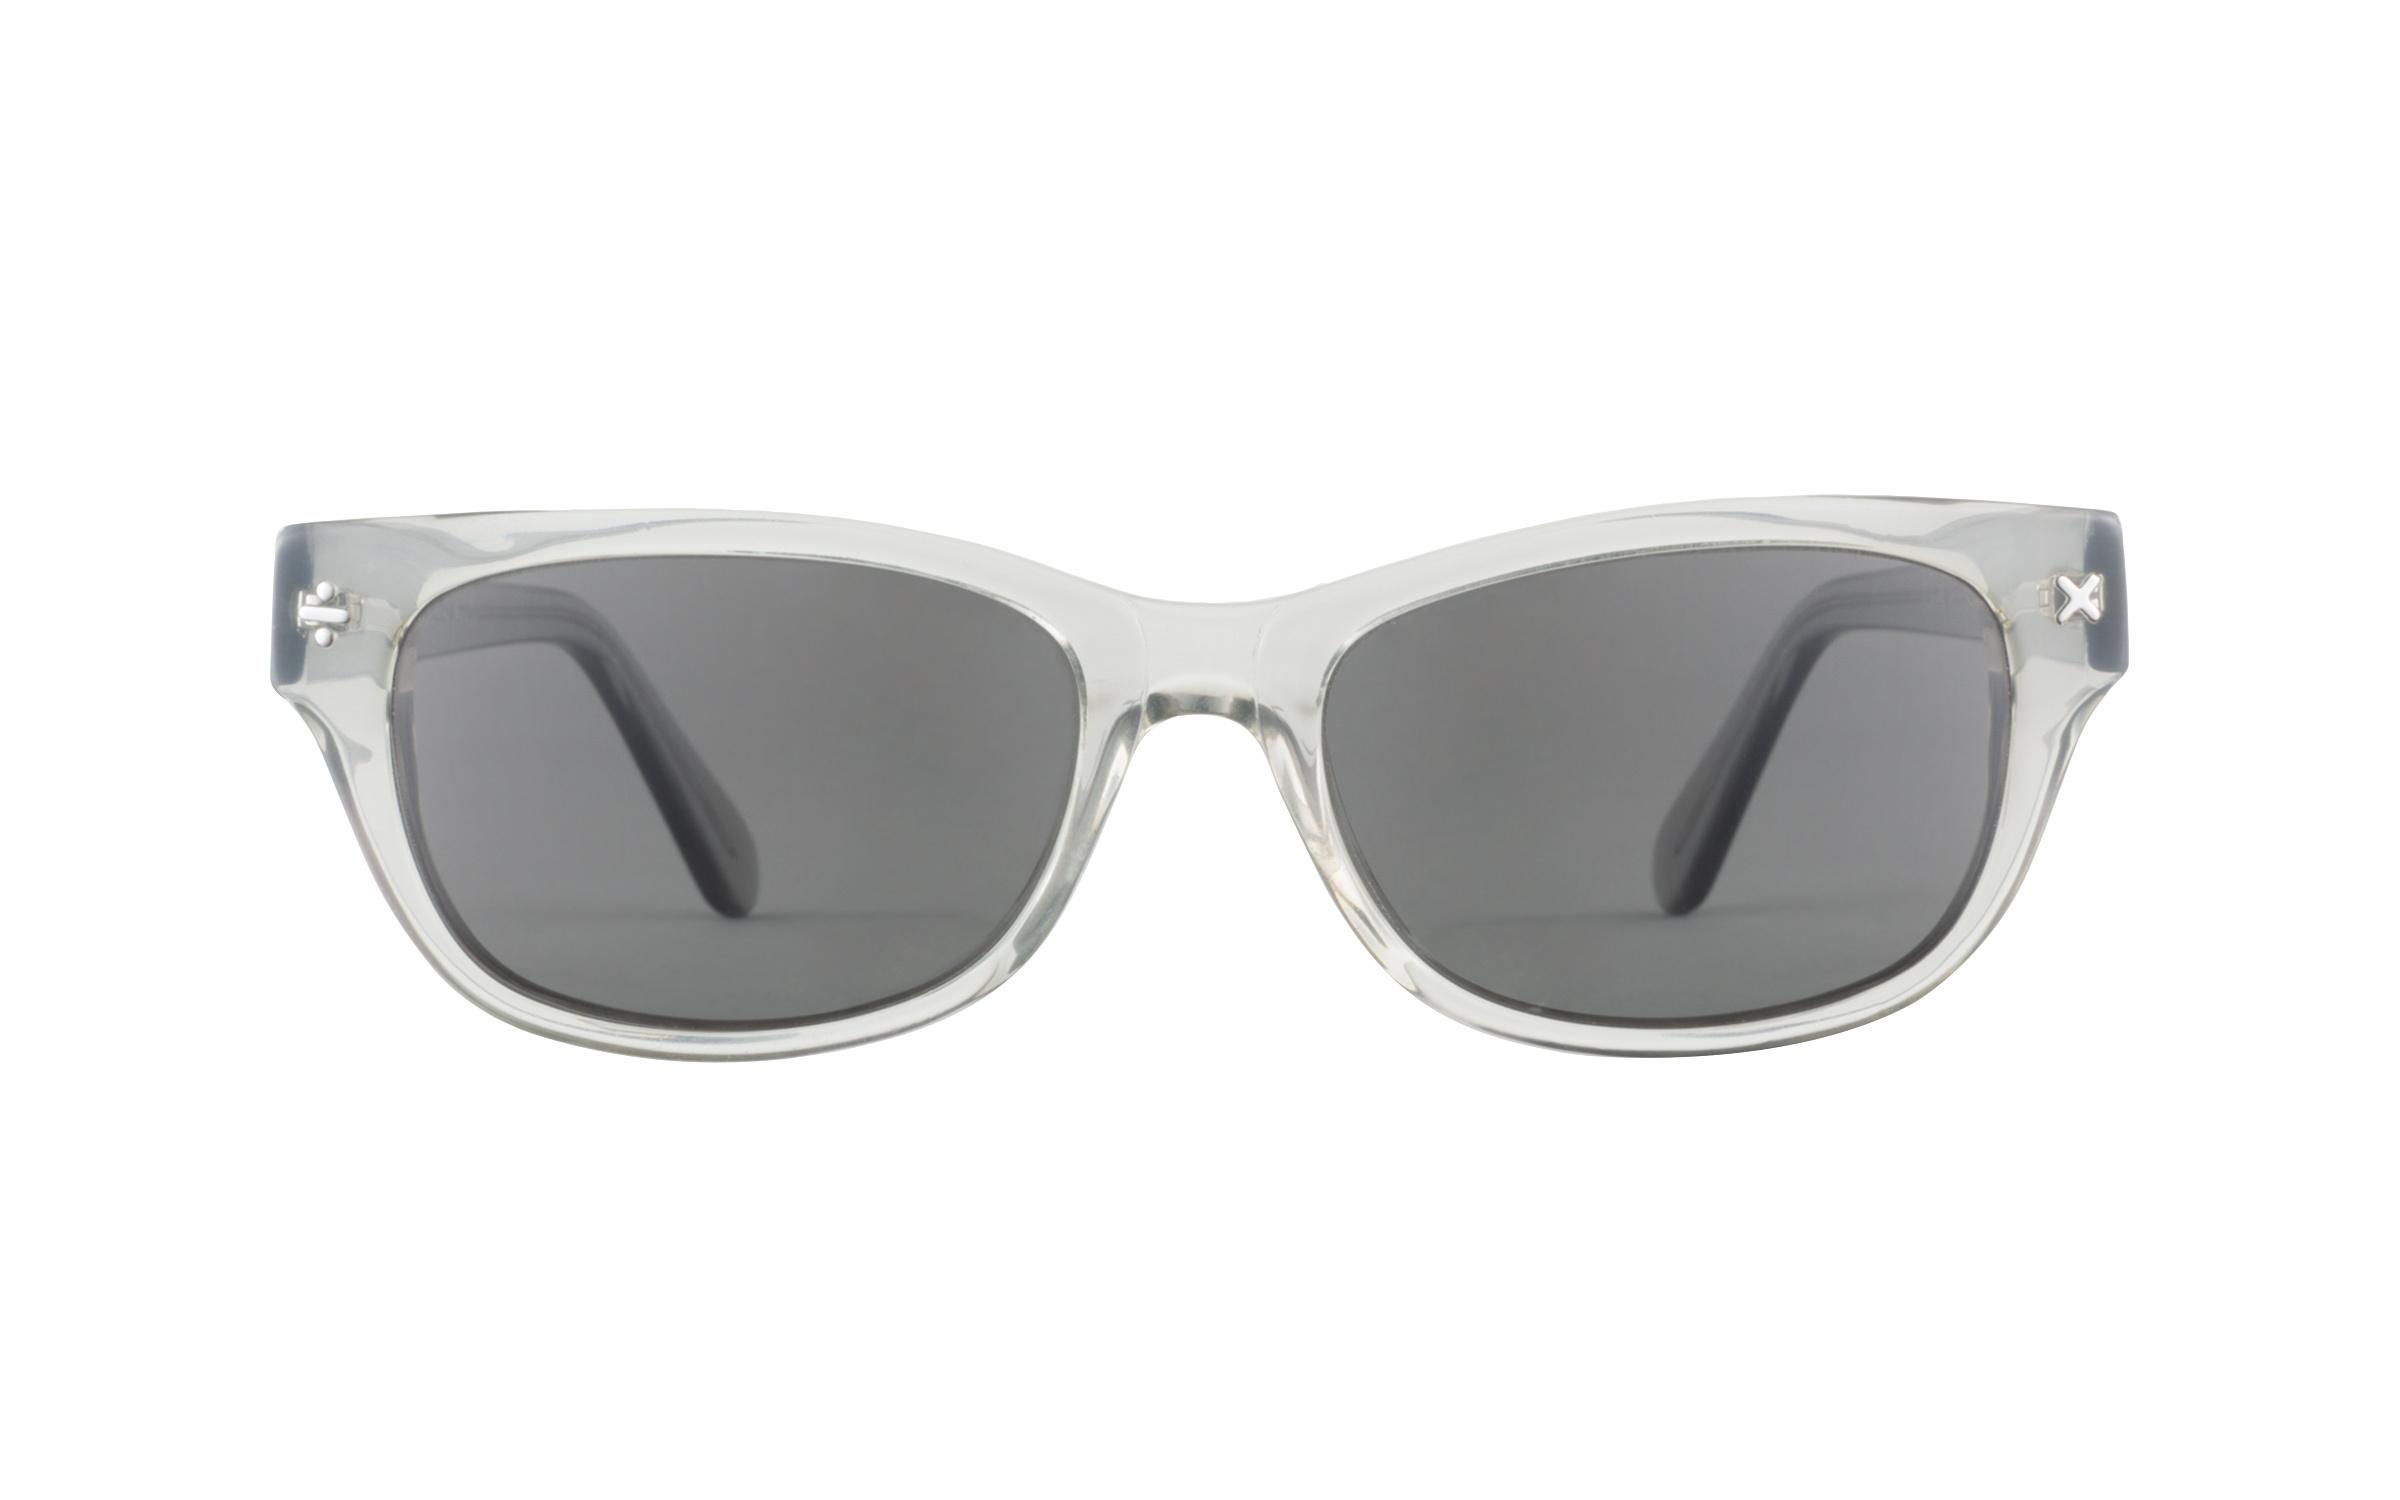 Retro_Sunglasses_Grey_Derek_Cardigan_Online_Coastal